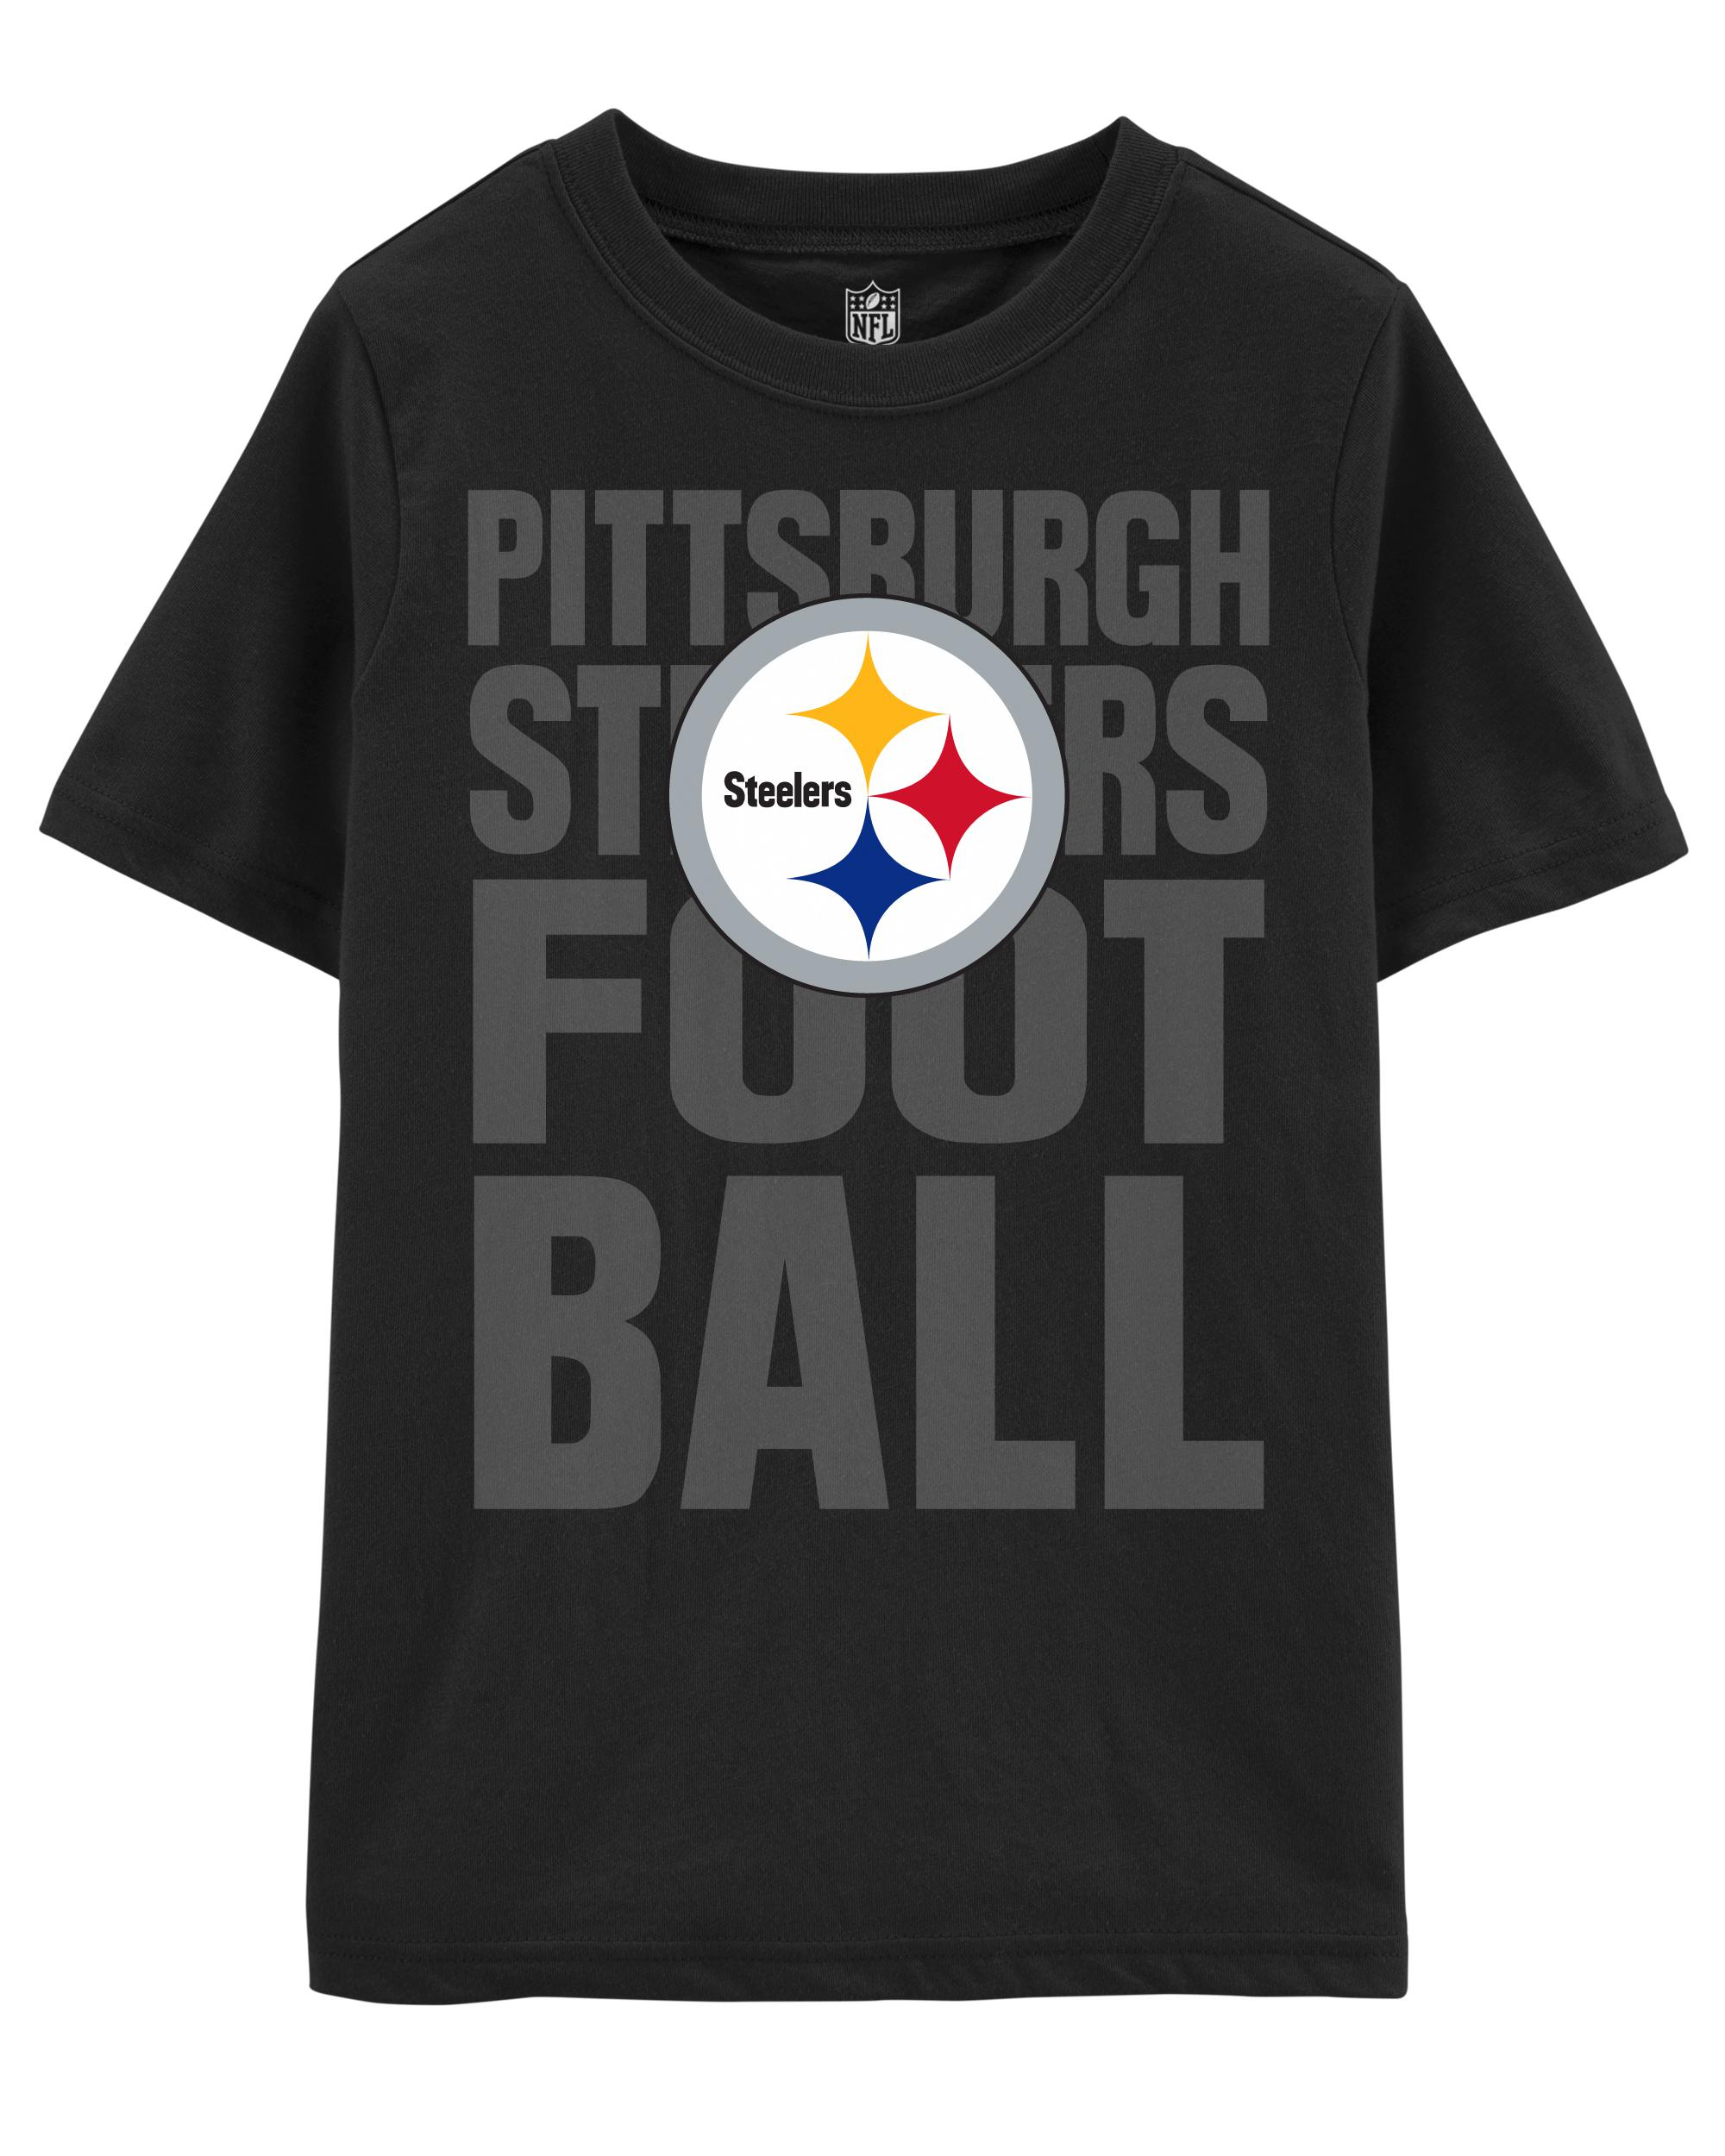 341bb2ba NFL Pittsburgh Steelers Tee   carters.com